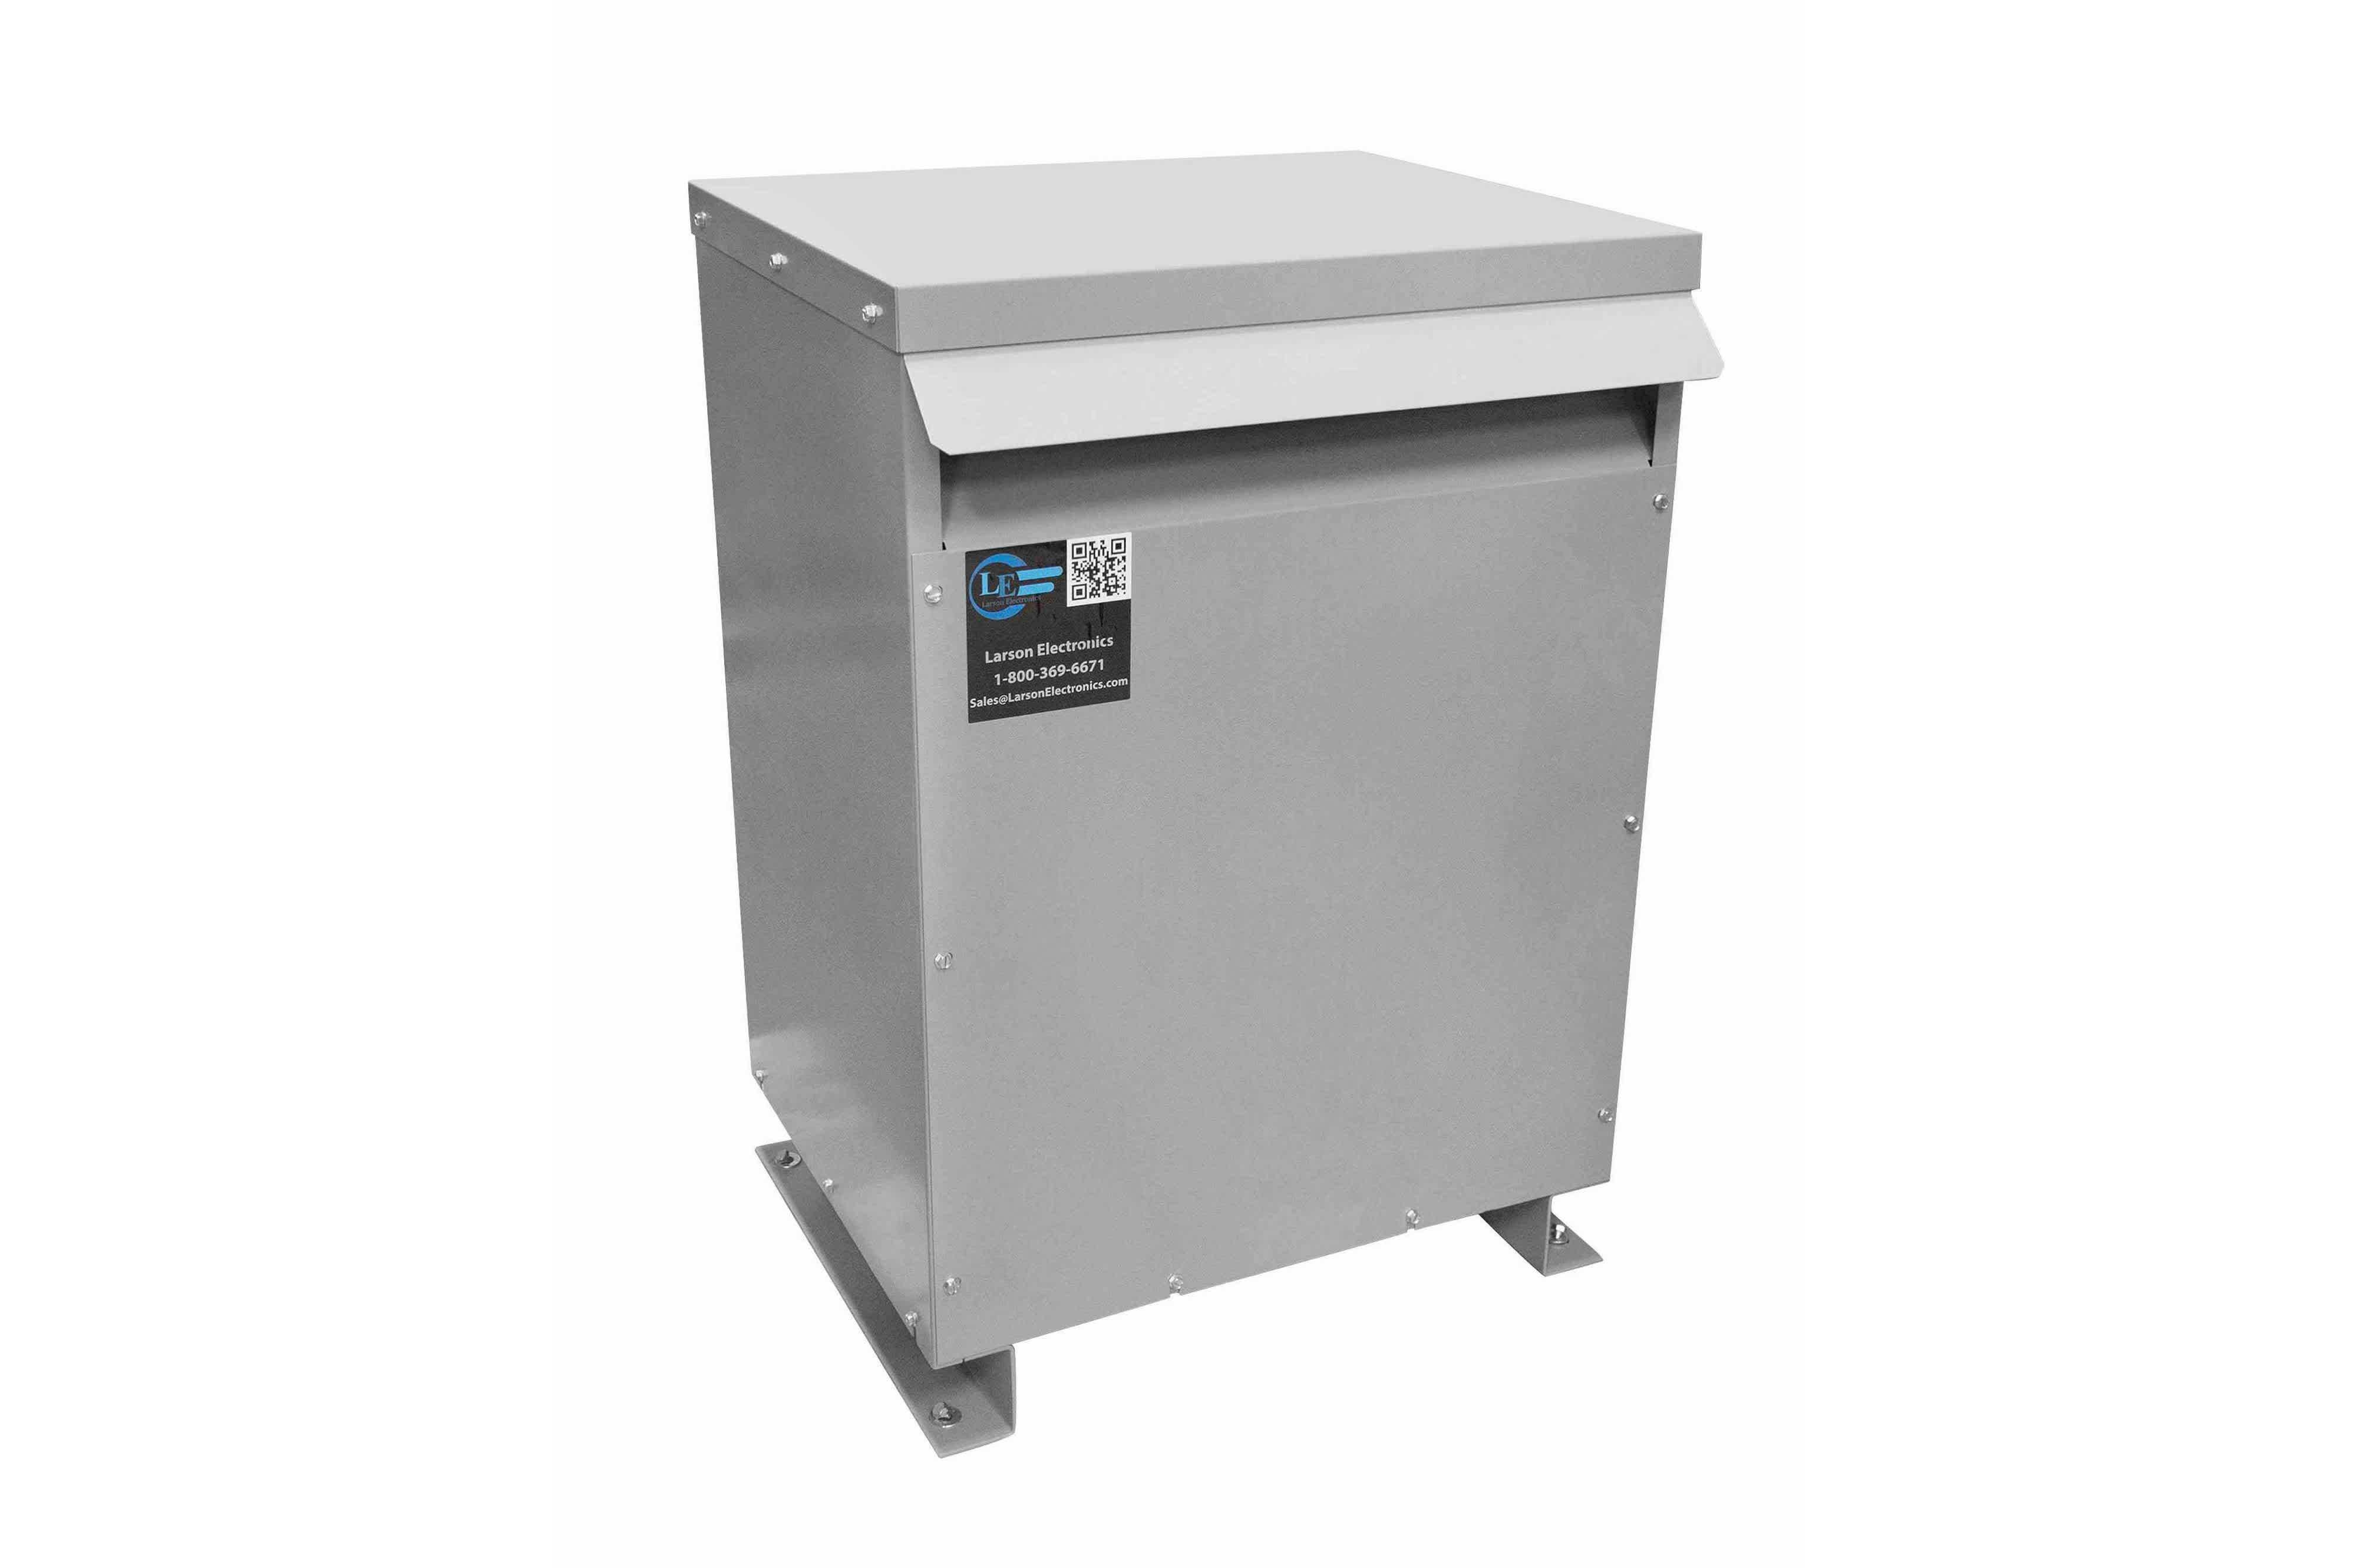 12 kVA 3PH Isolation Transformer, 208V Wye Primary, 600V Delta Secondary, N3R, Ventilated, 60 Hz